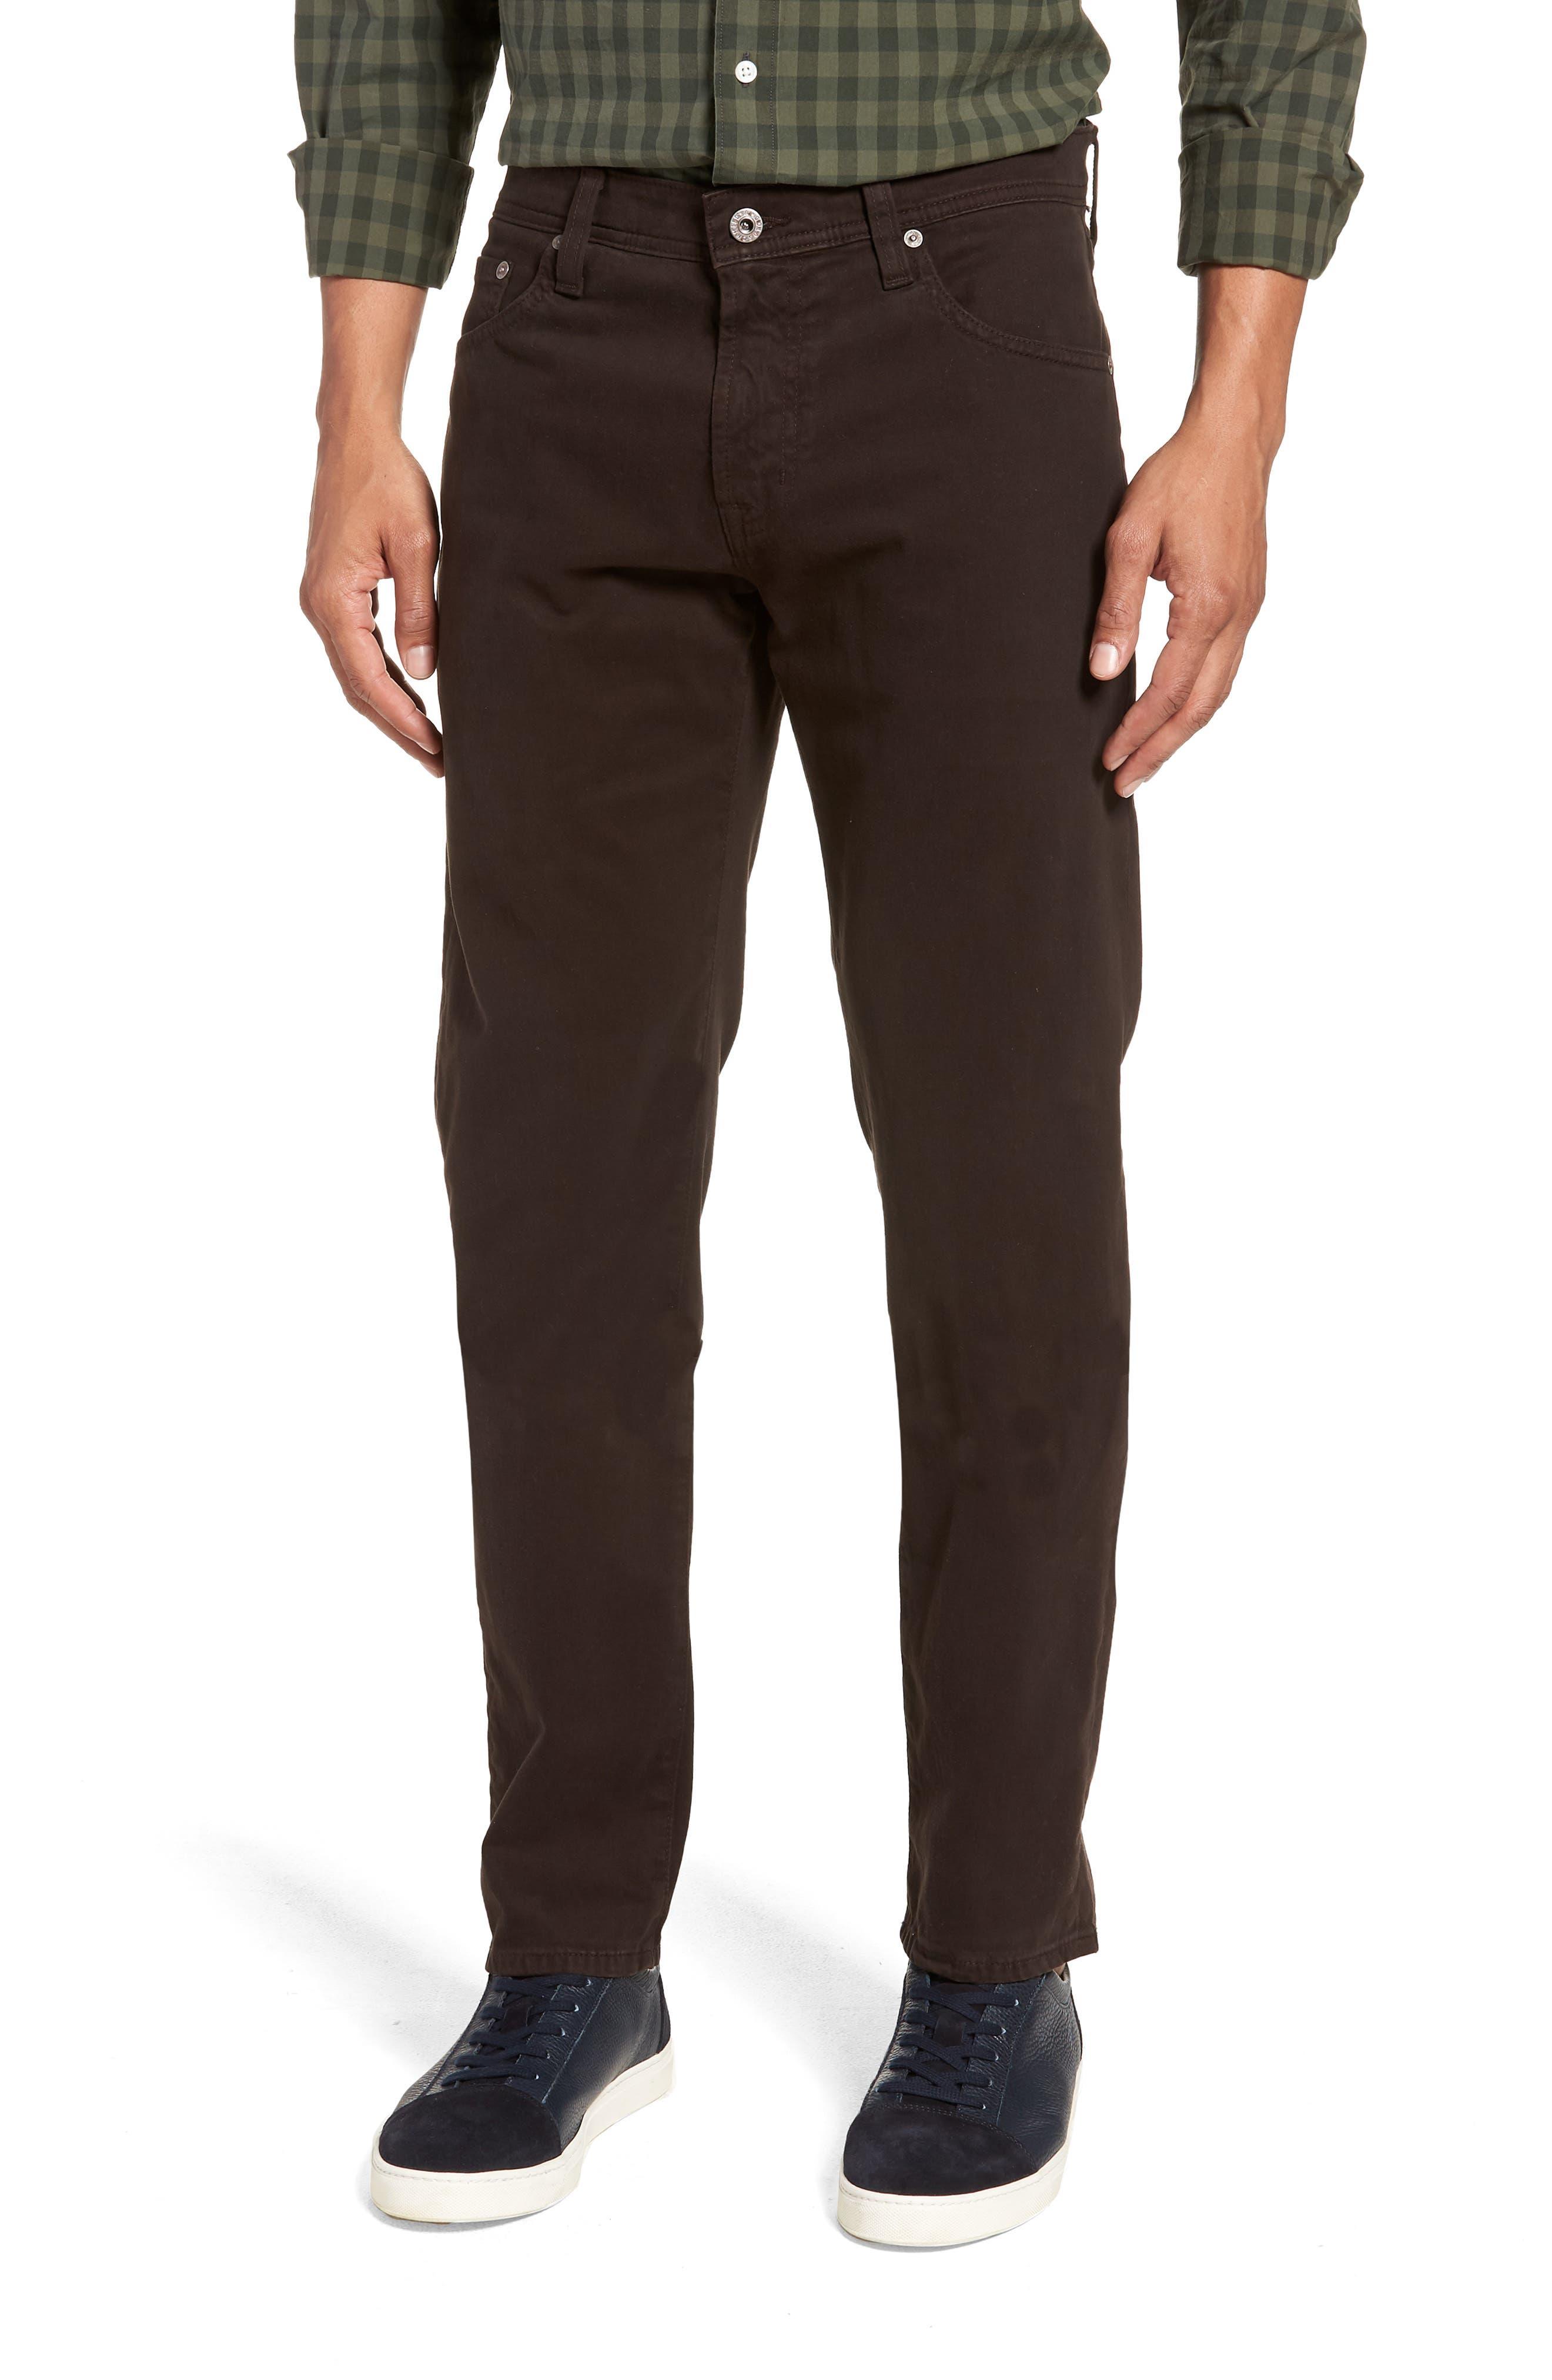 Tellis SUD Modern Slim Stretch Twill Pants,                             Main thumbnail 1, color,                             Shutter Brown